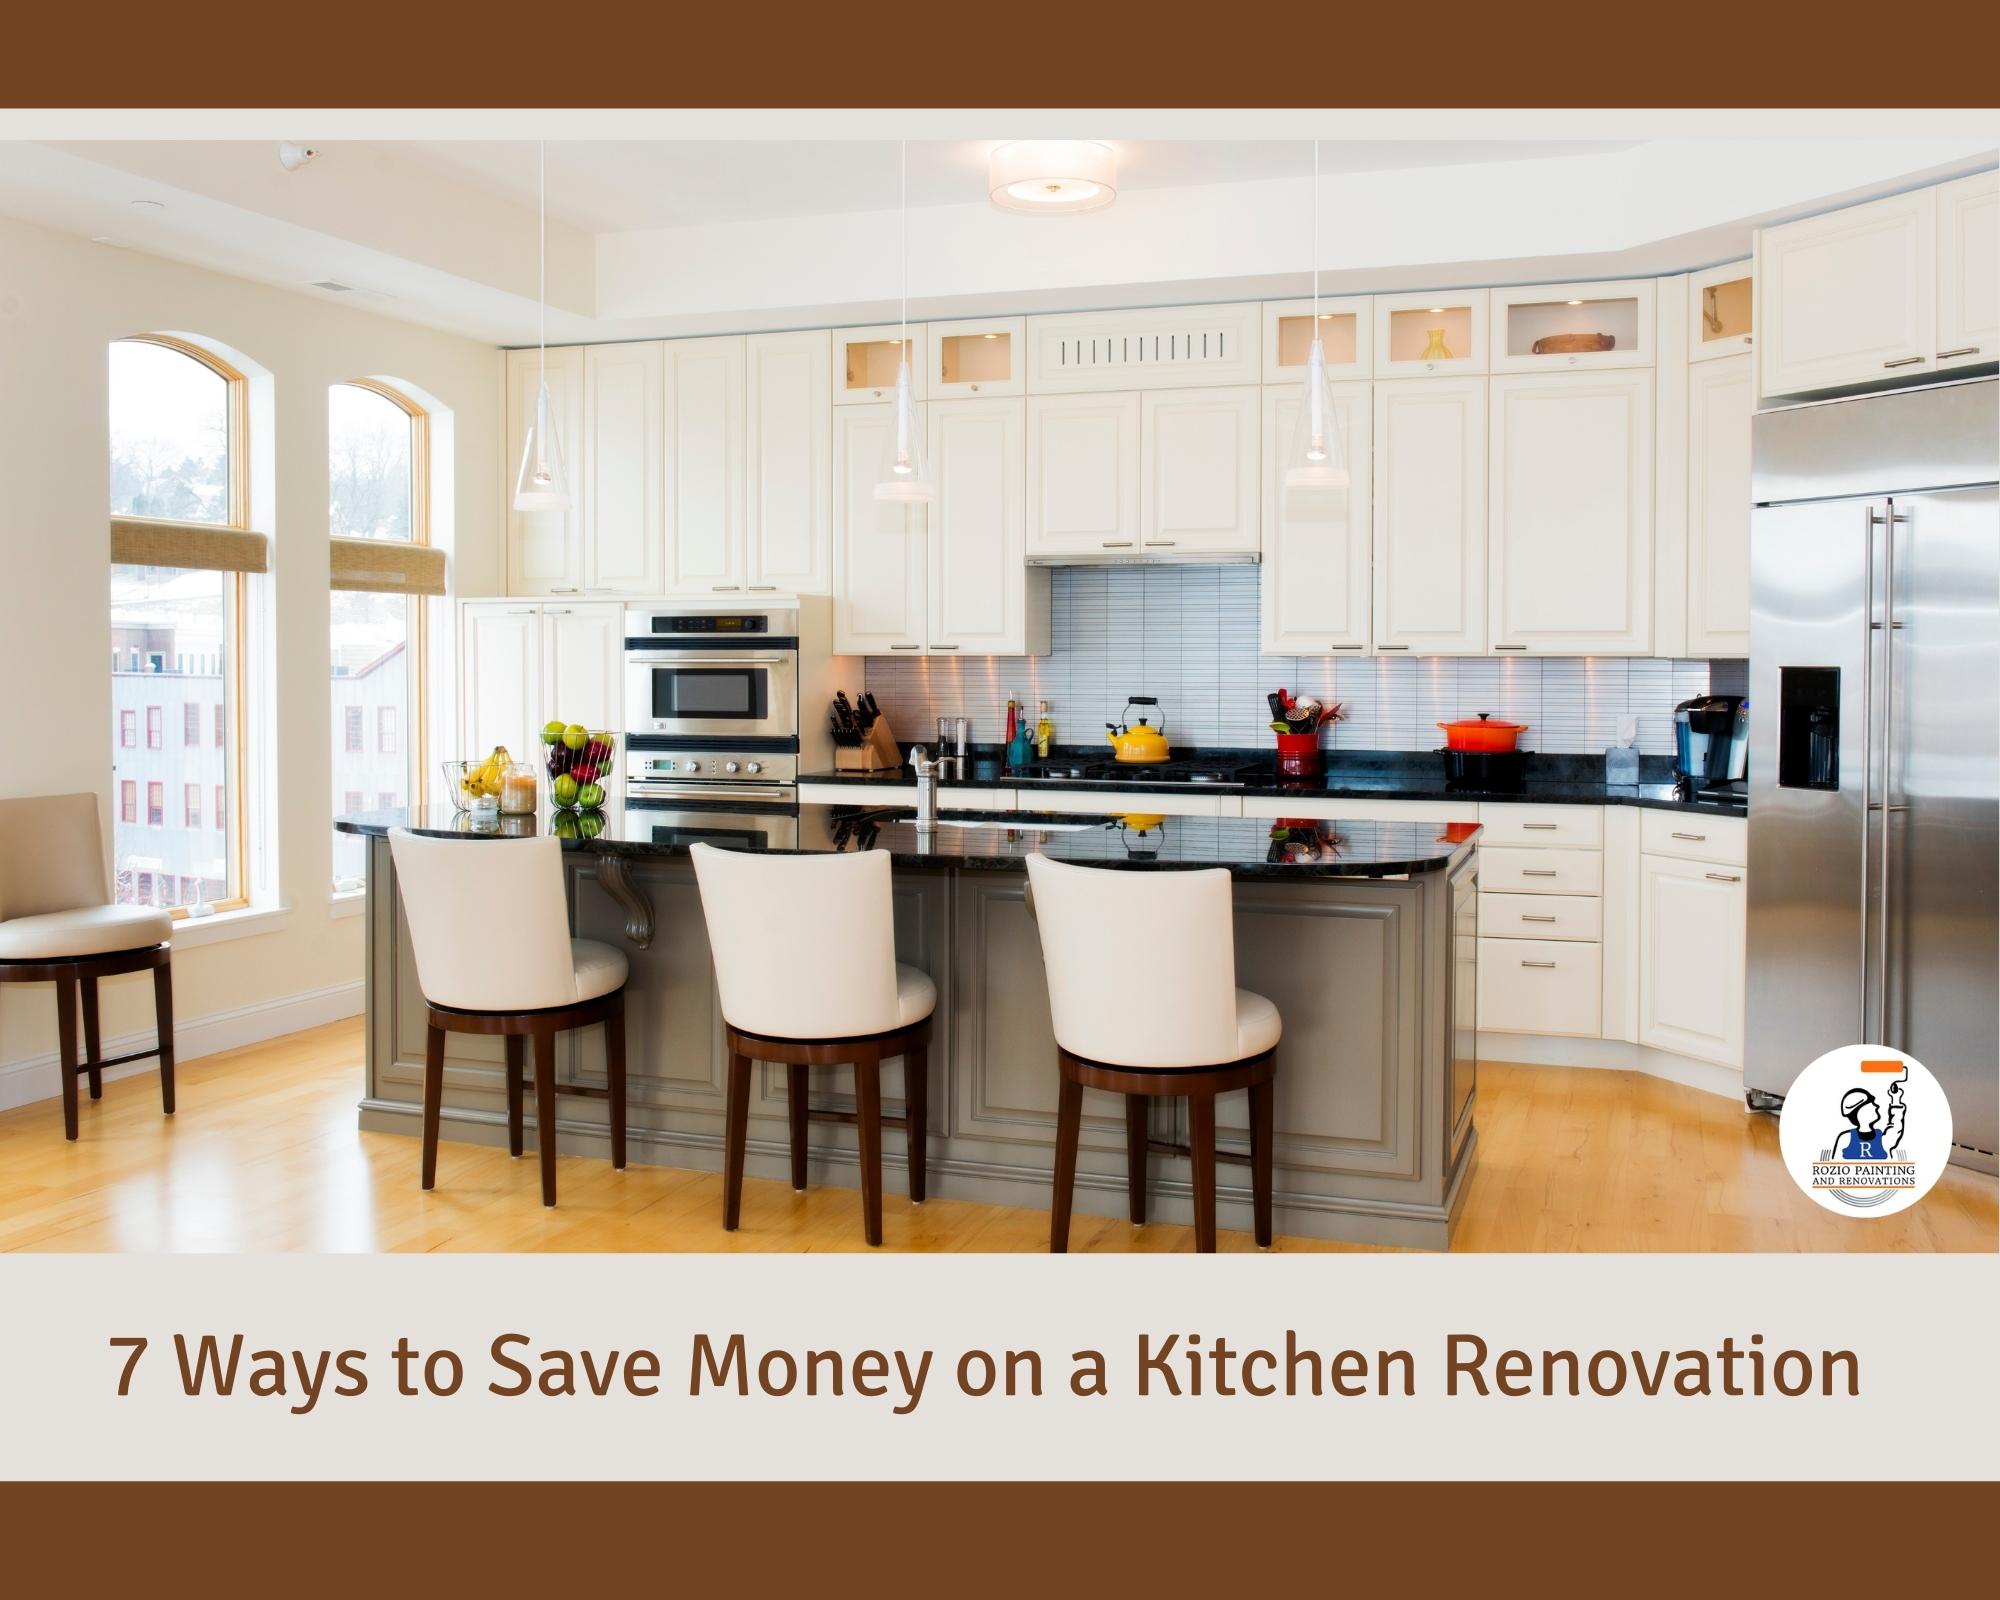 7 Ways to Save Money on a Kitchen Renovation